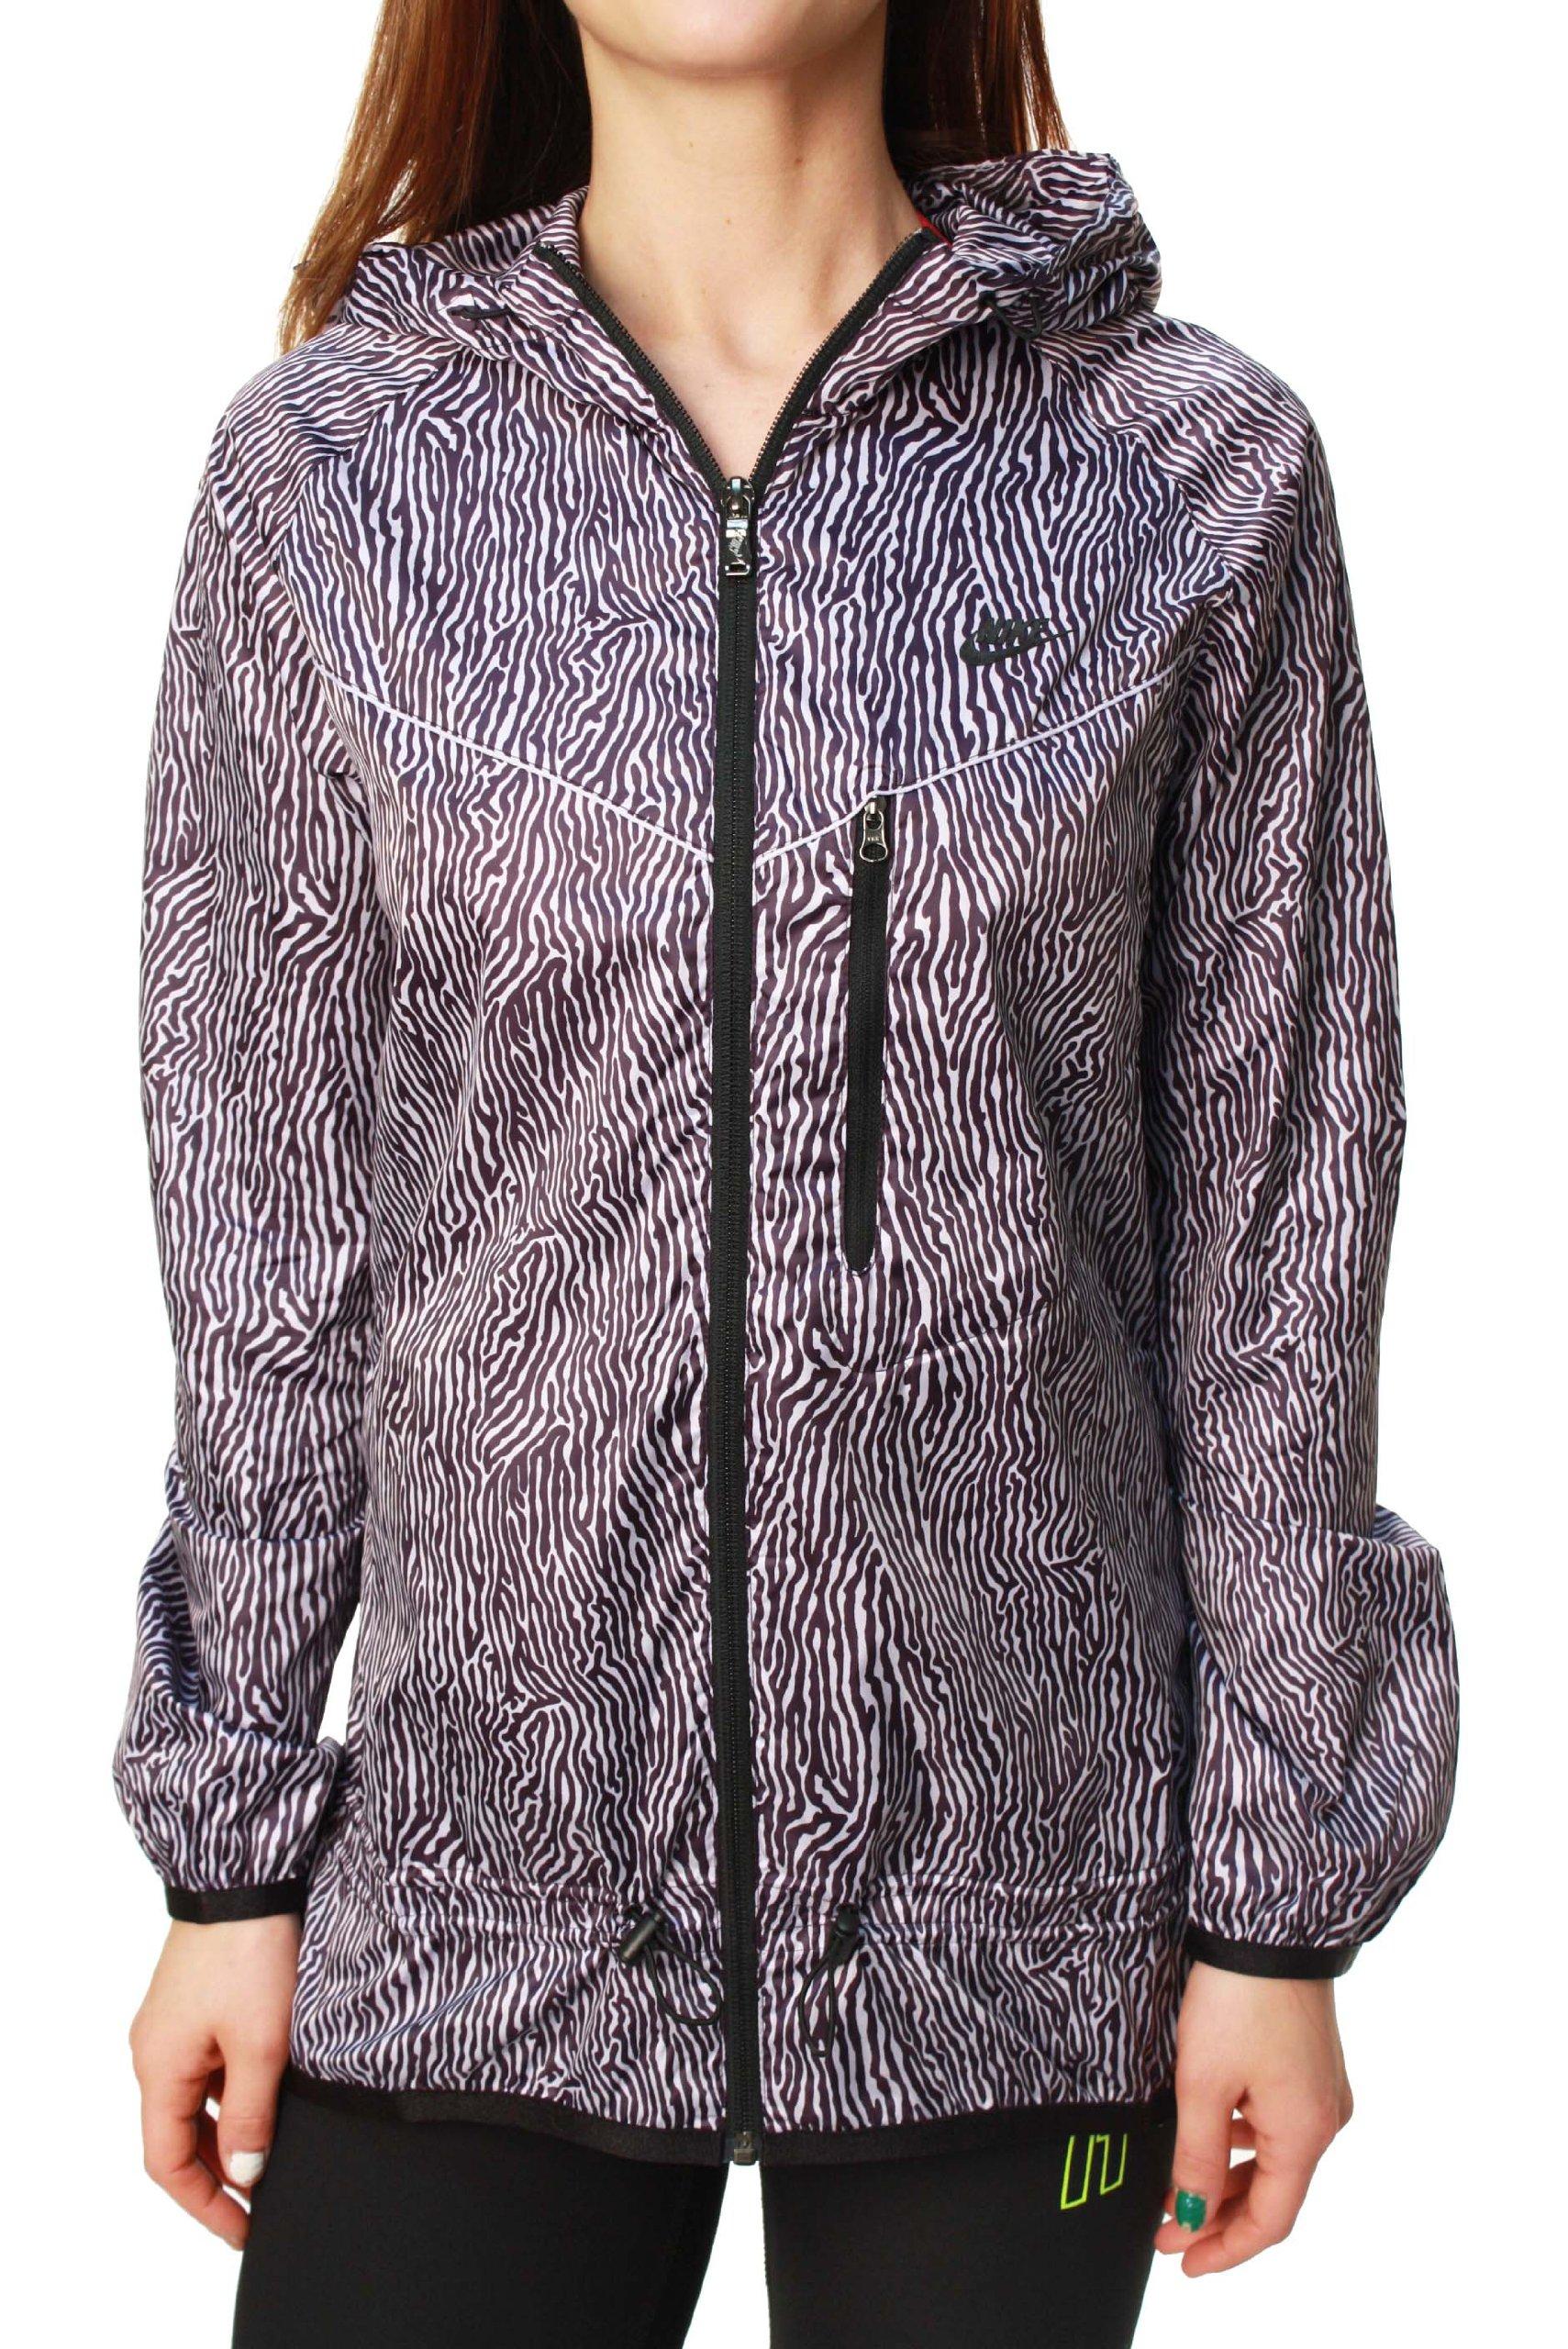 Nike Women's RU Blacklight Flash Printed Windrunner Purple Dynasty/Violet Frost MD